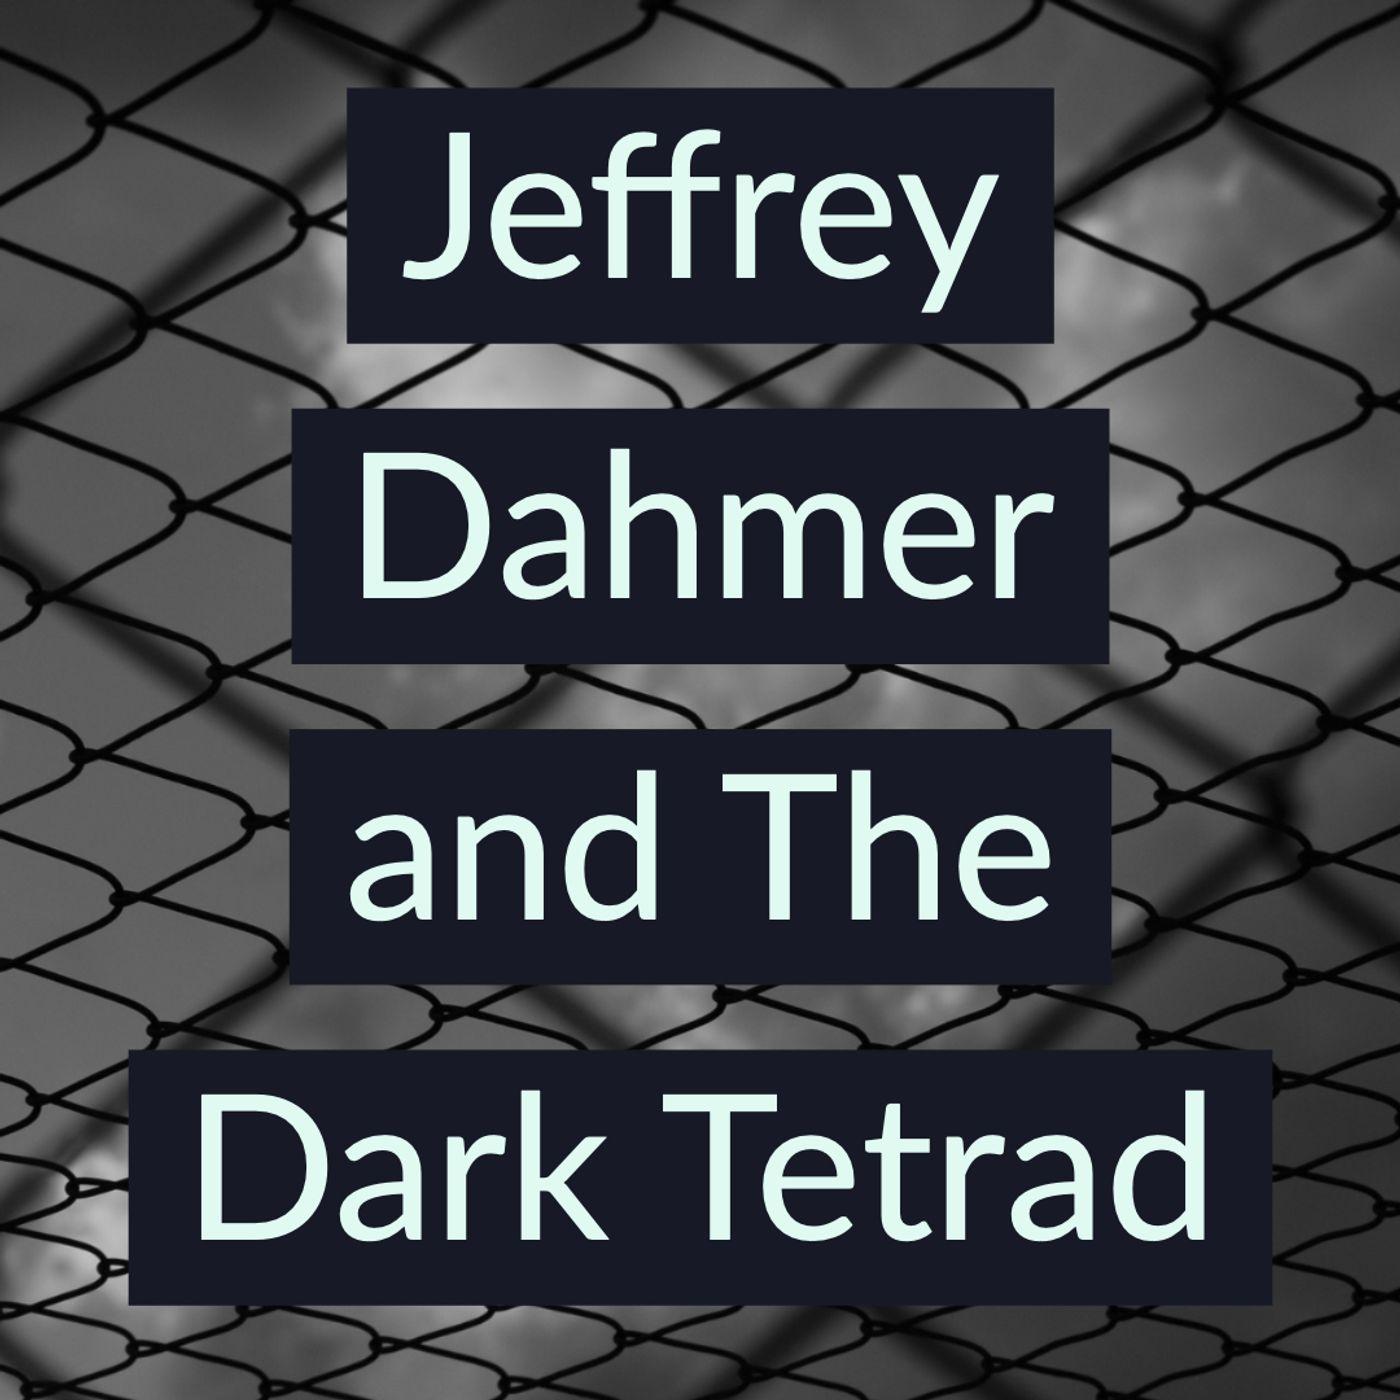 Jeffrey Dahmer and The Dark Tetrad (2019 Rerun)